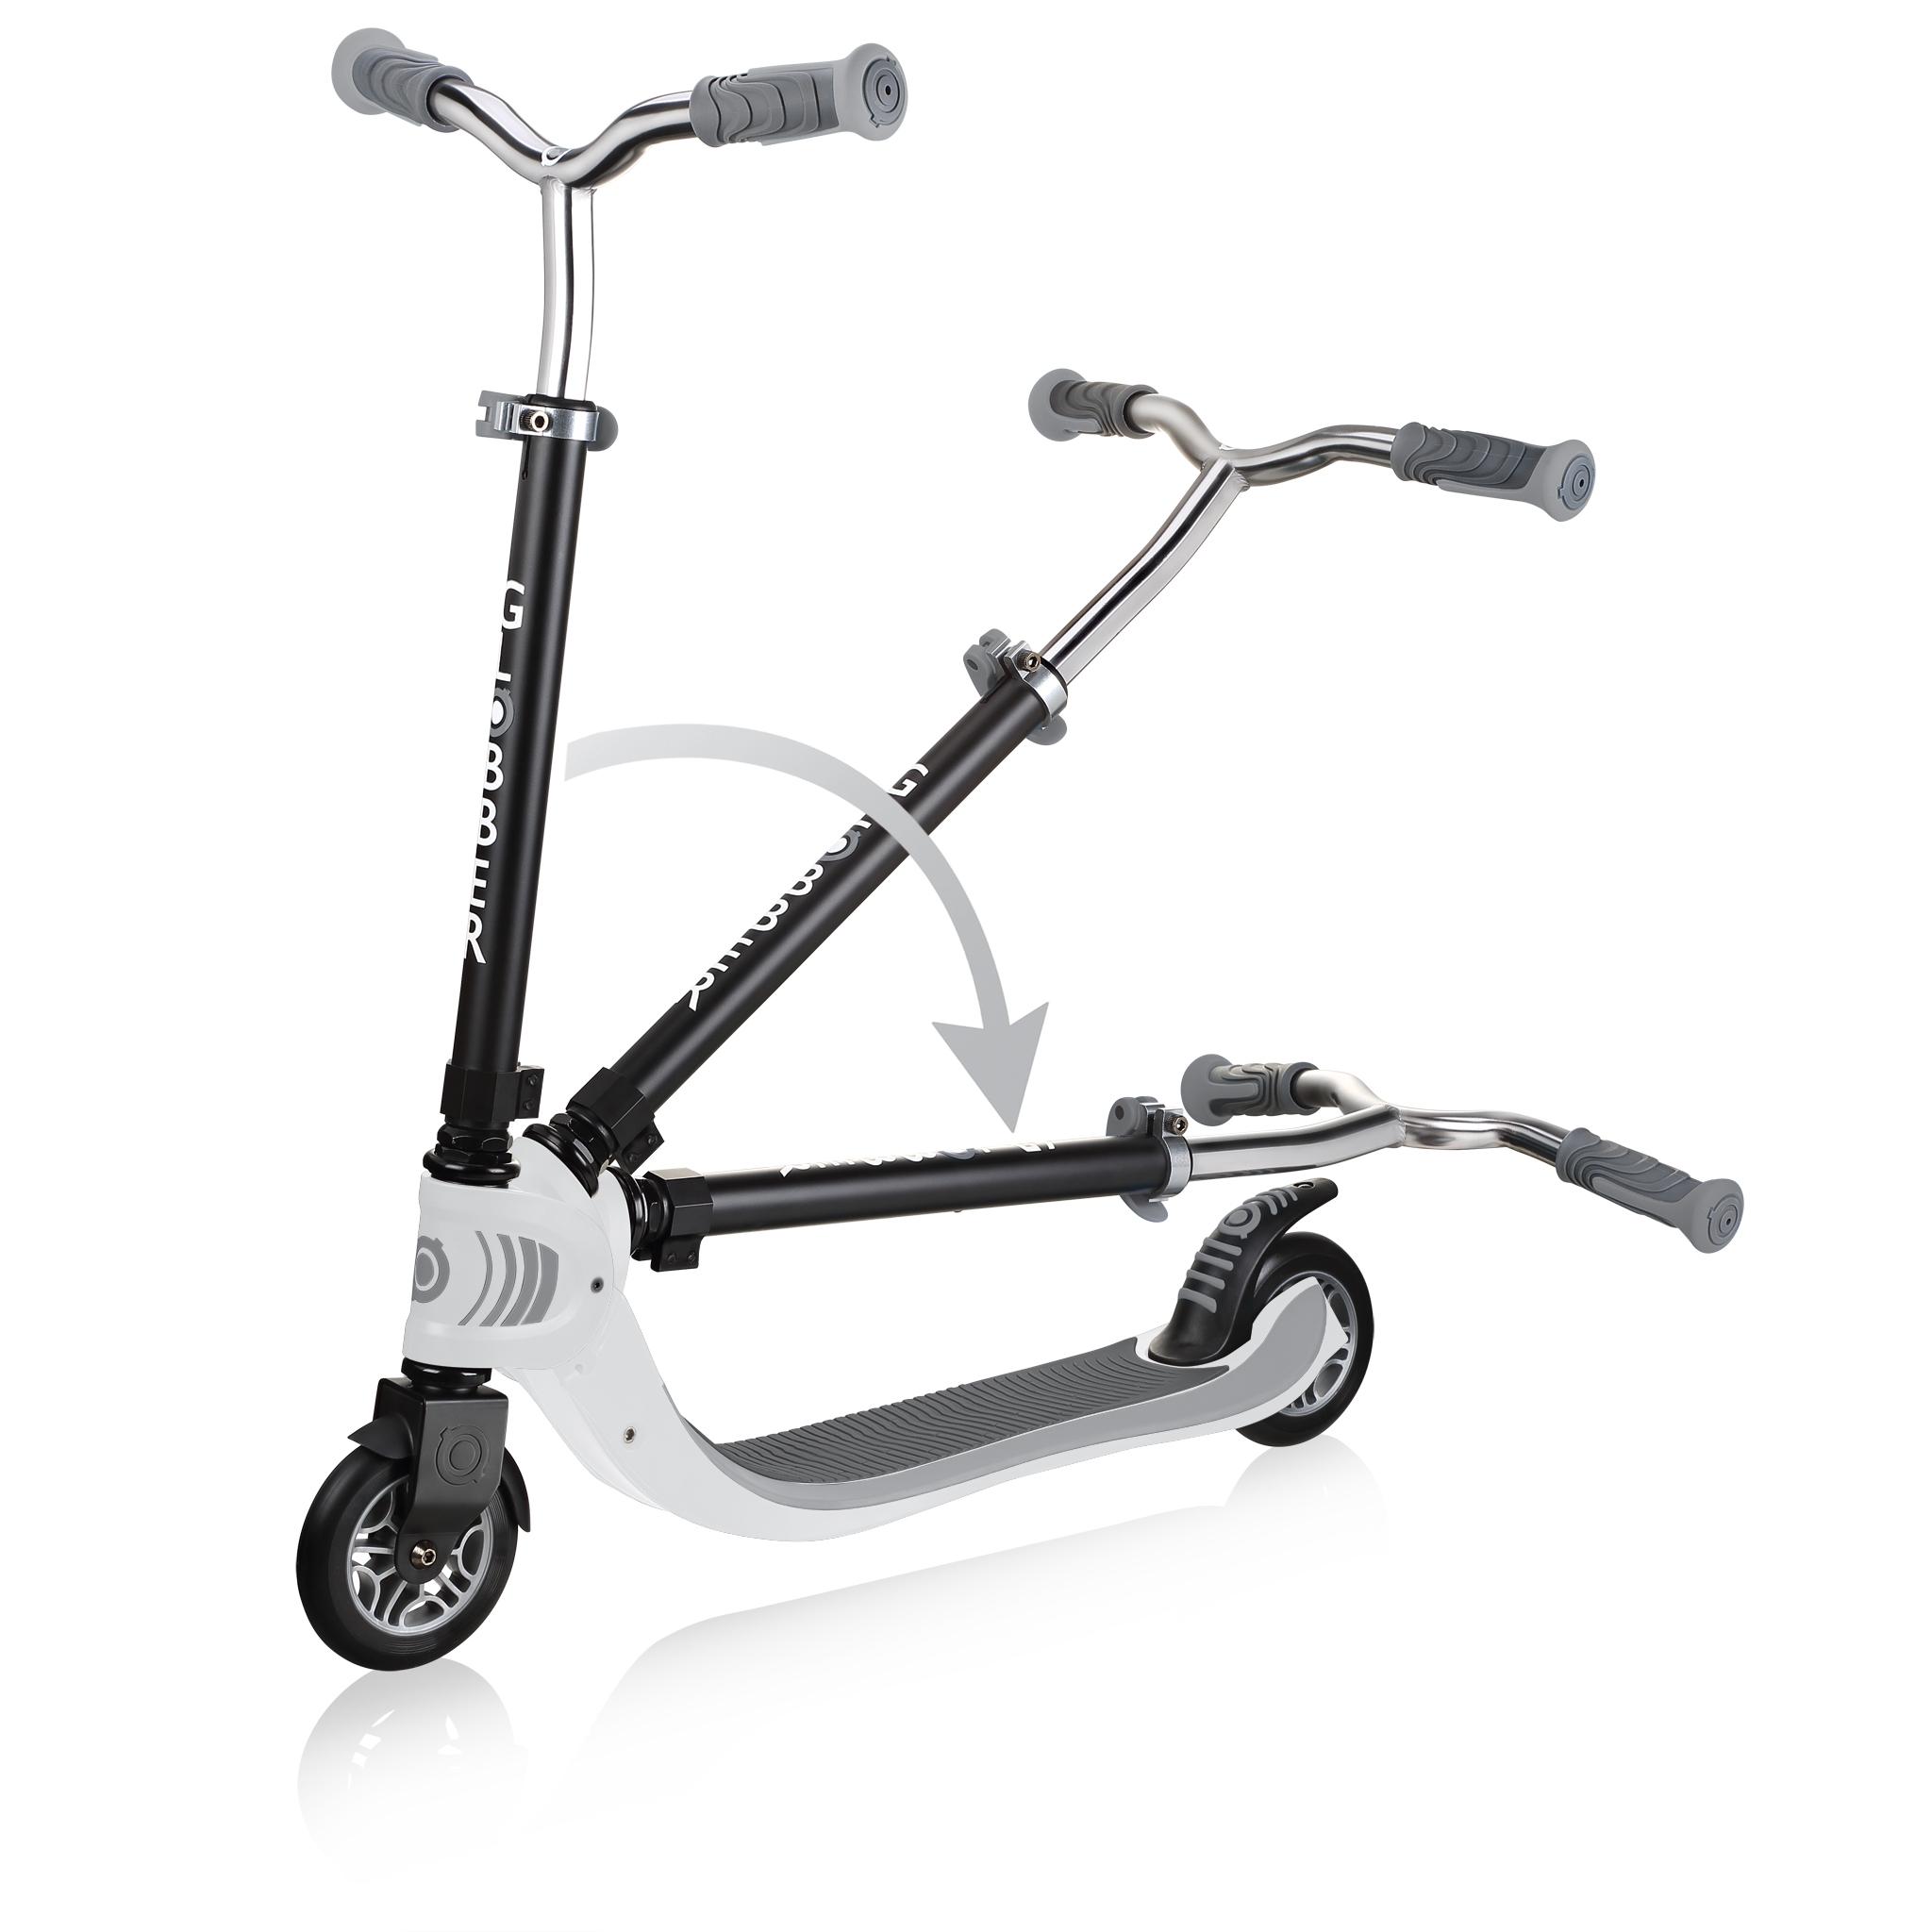 FLOW-FOLDABLE-125-2-wheel-folding-scooter-for-kids-white 2